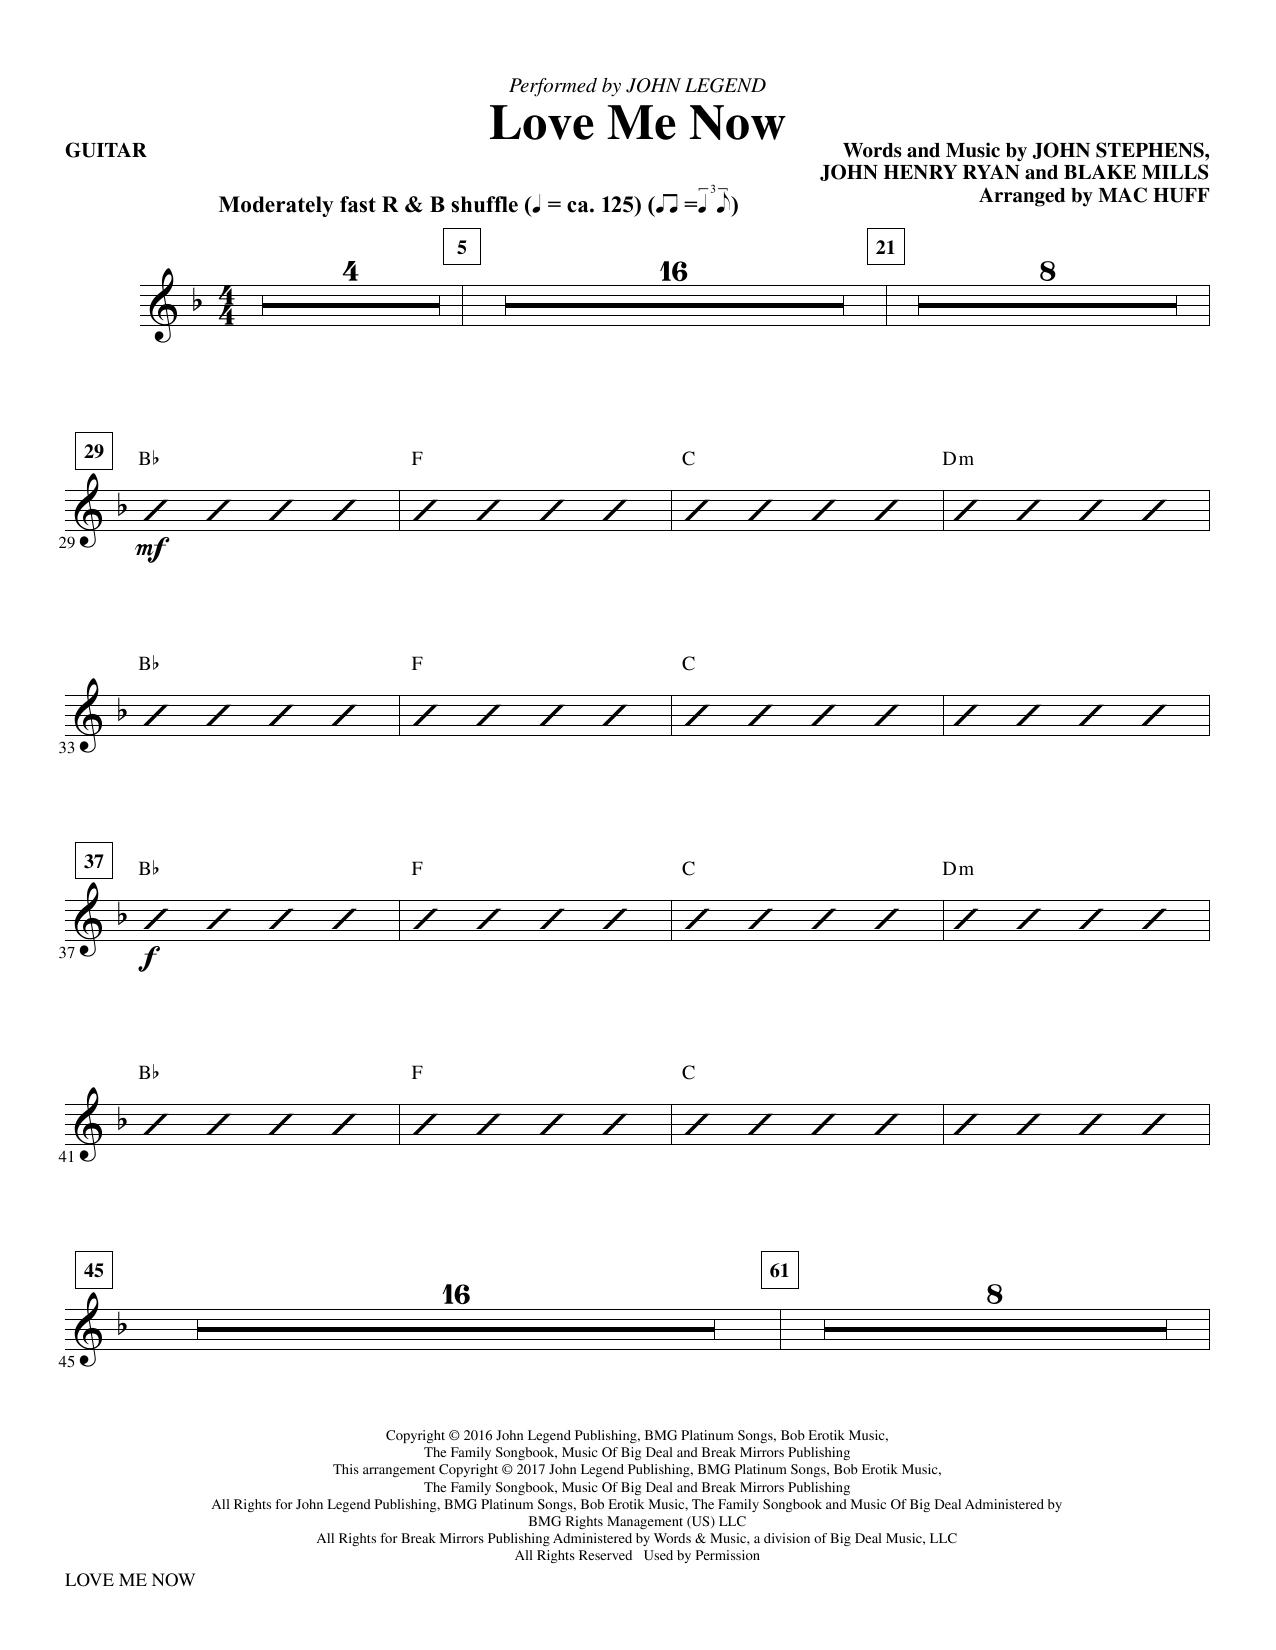 Love Me Now - Guitar Sheet Music